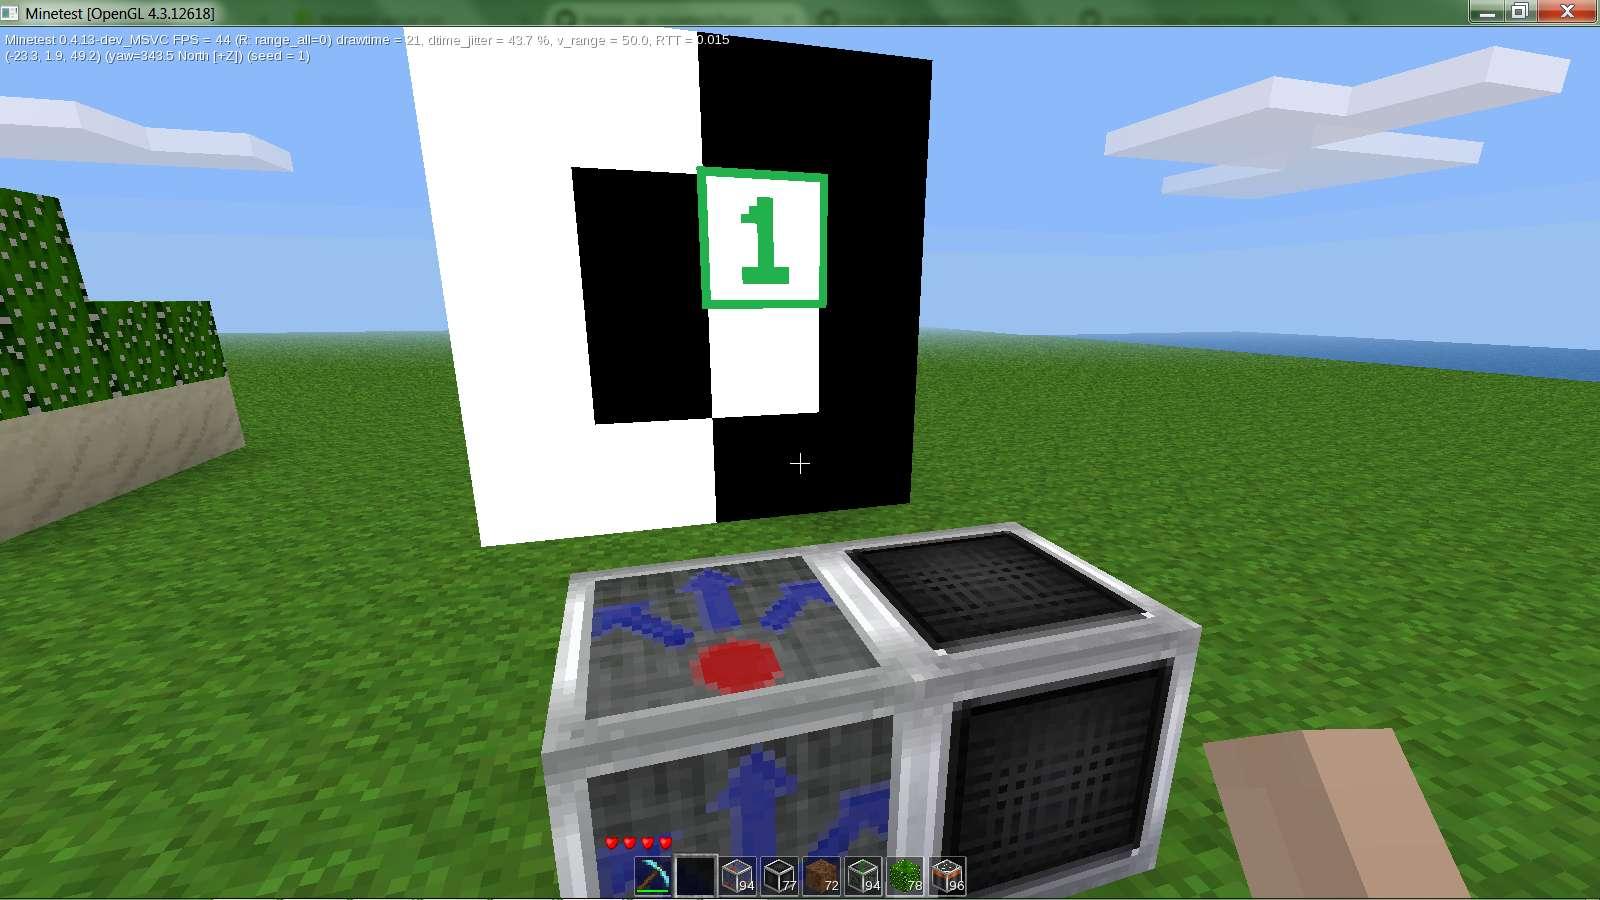 keypad1